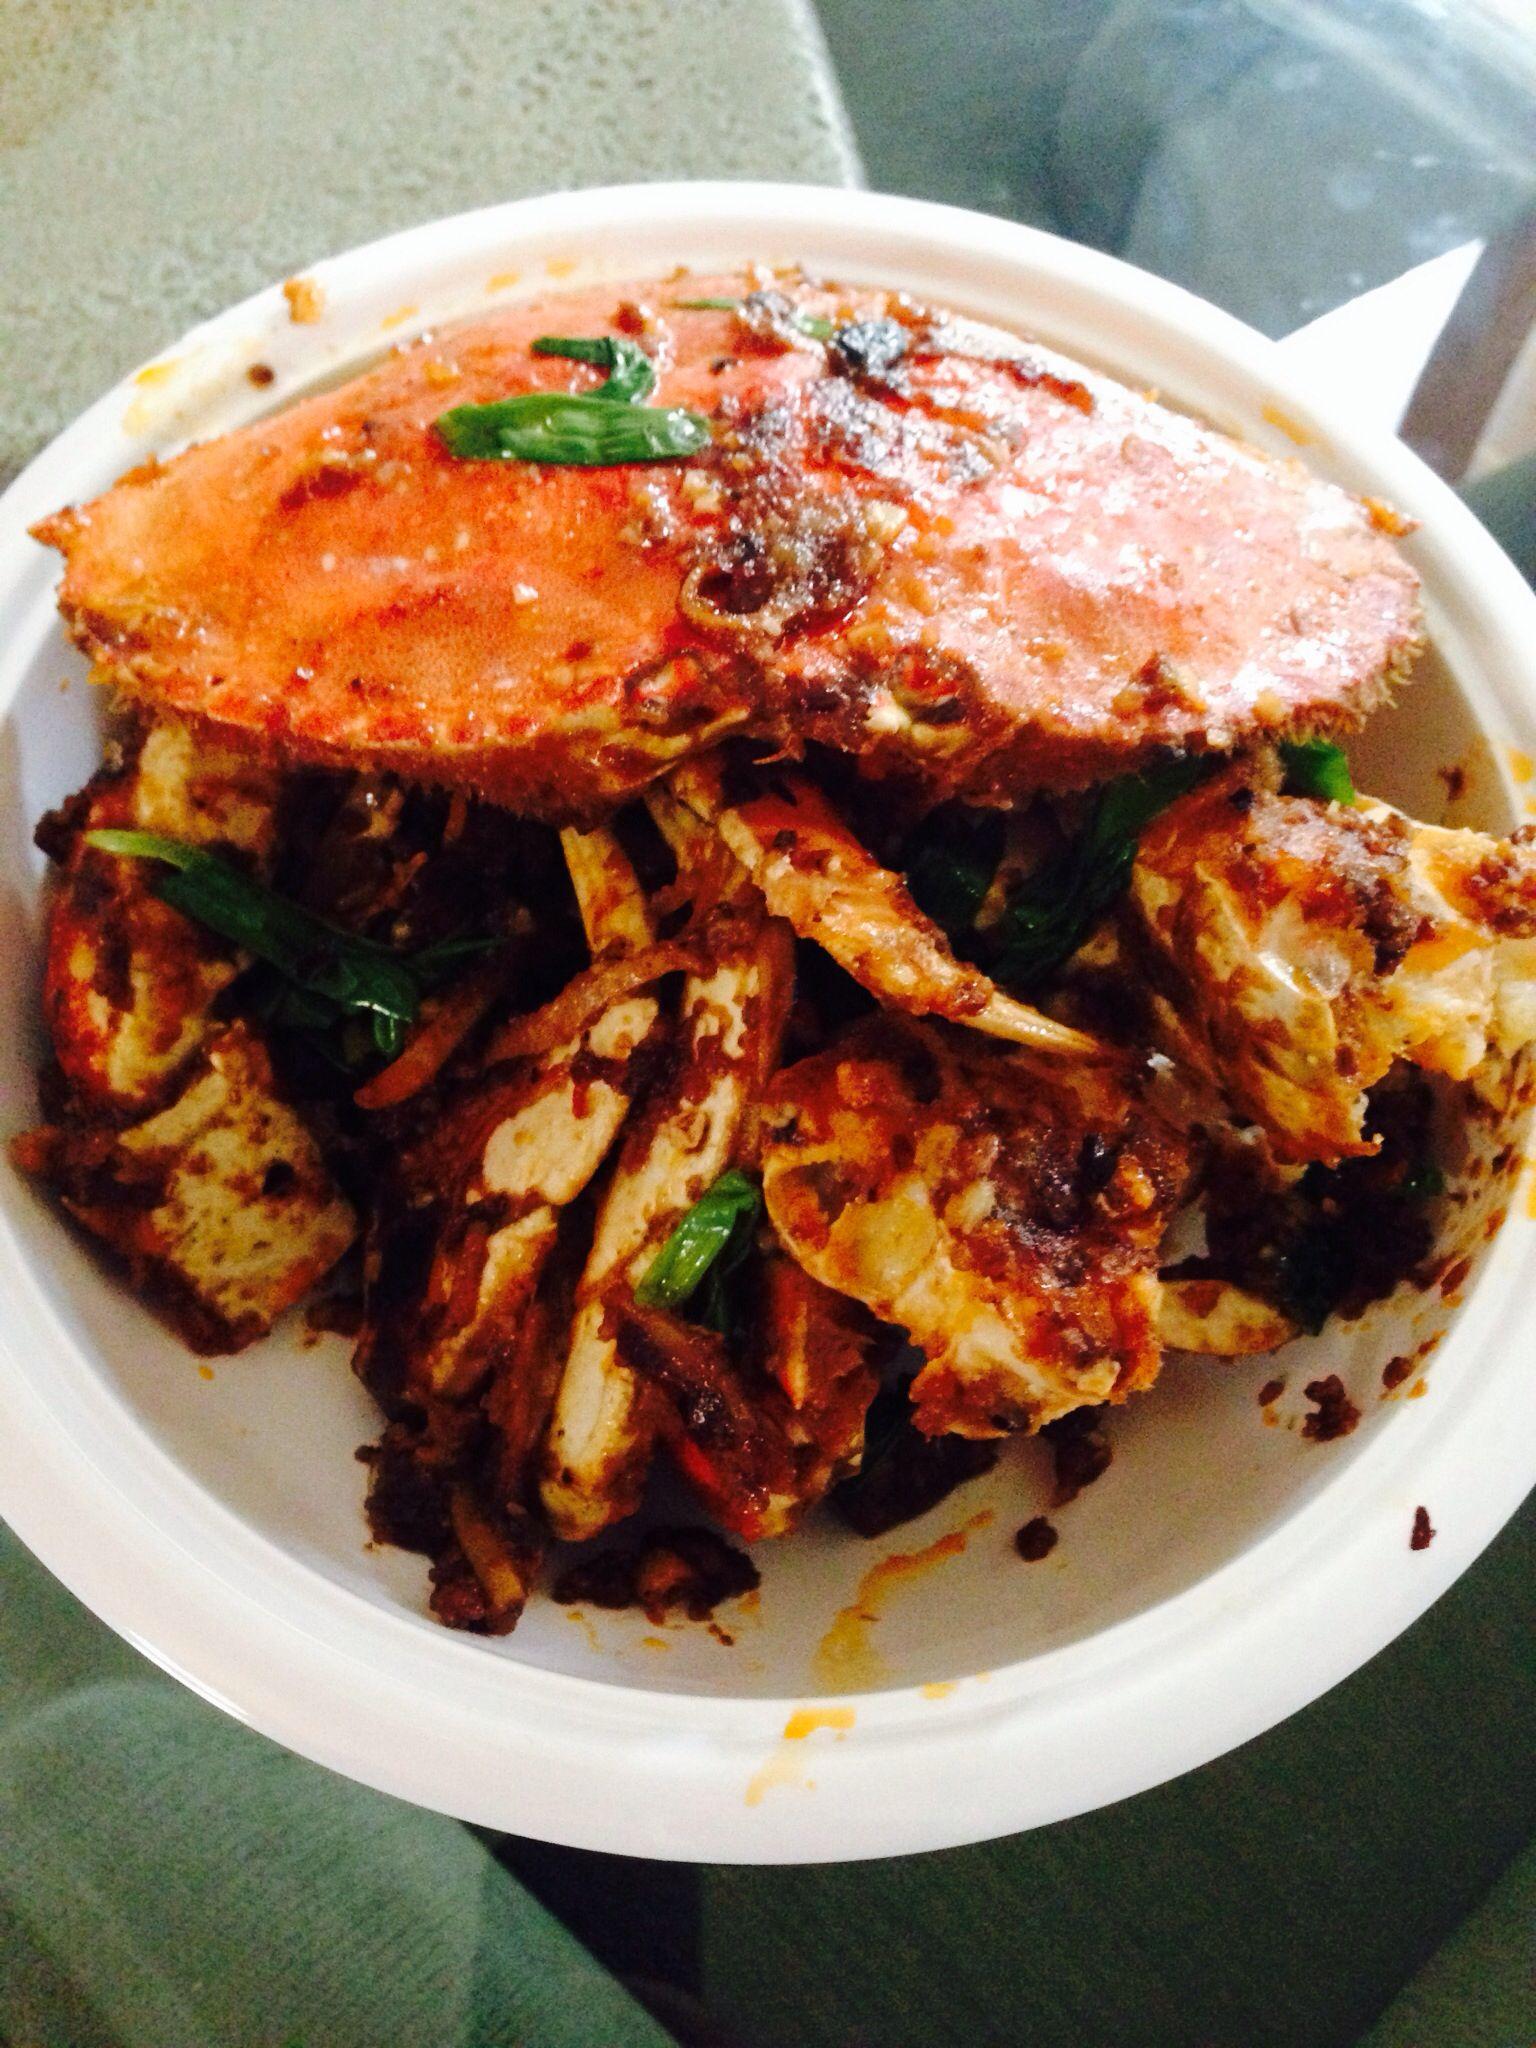 Crab recipe stir fried asian style agree